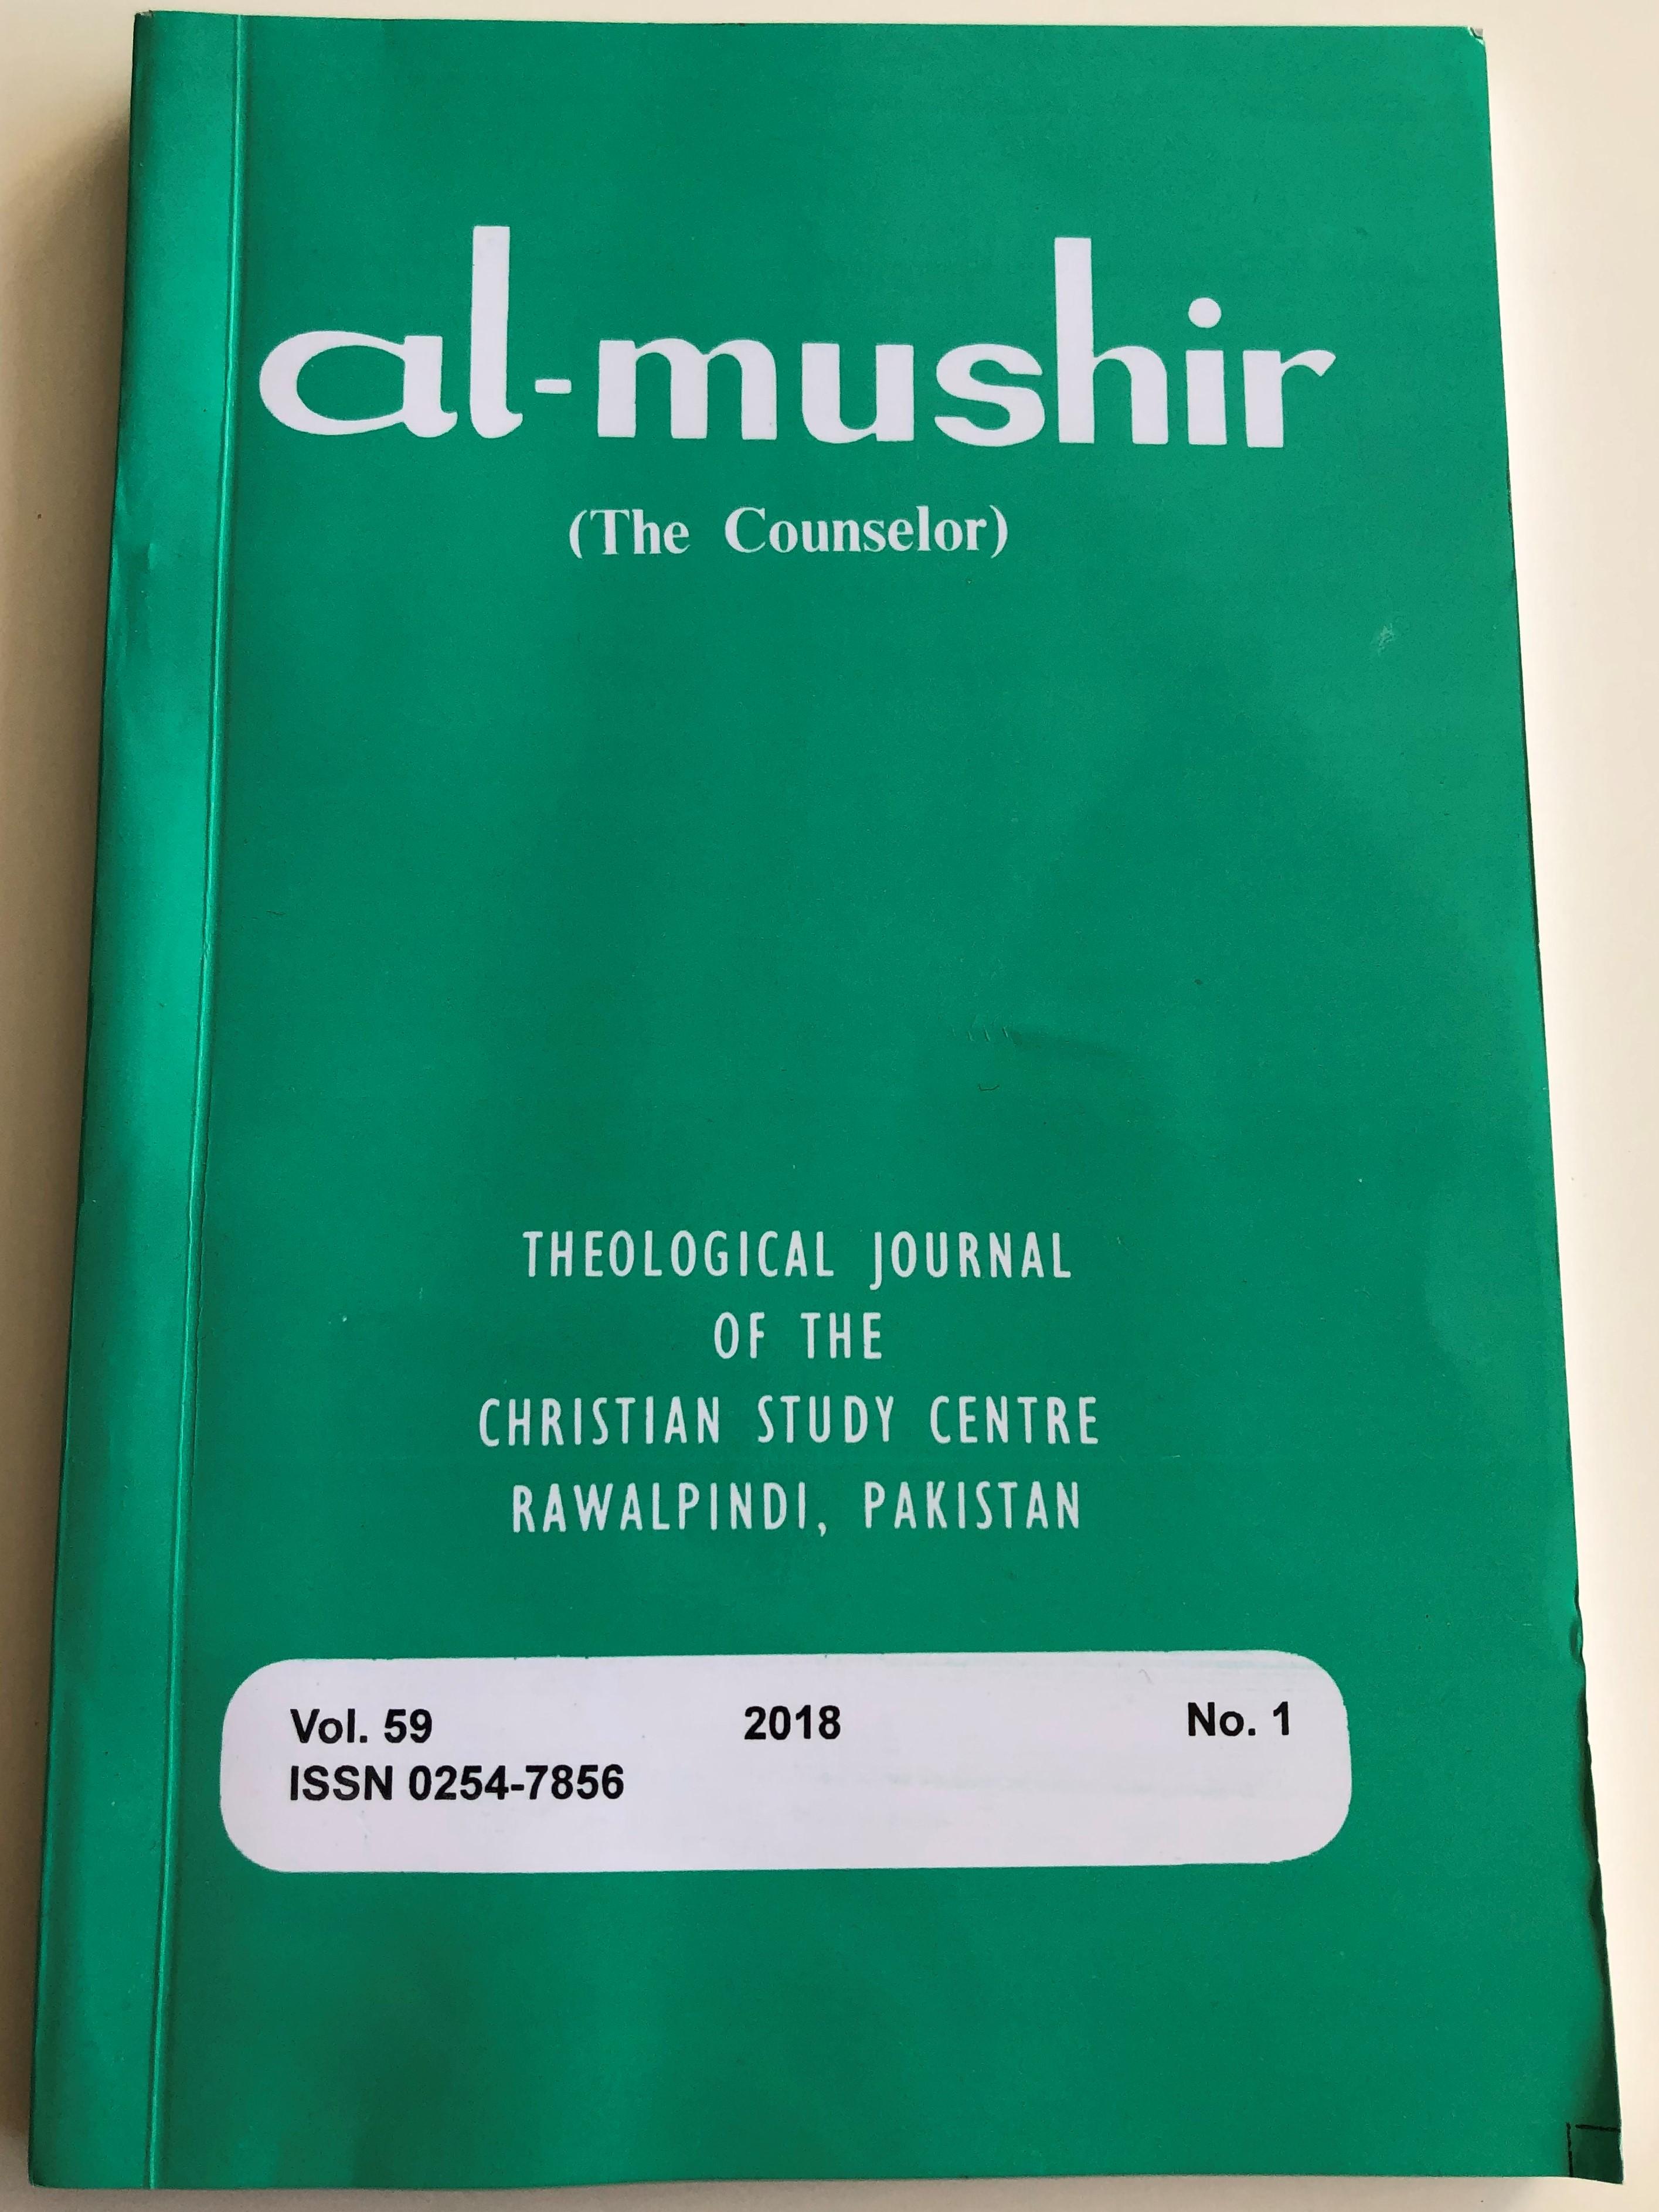 al-mushir-the-counselor-volume-59.-no.-1-1.jpg